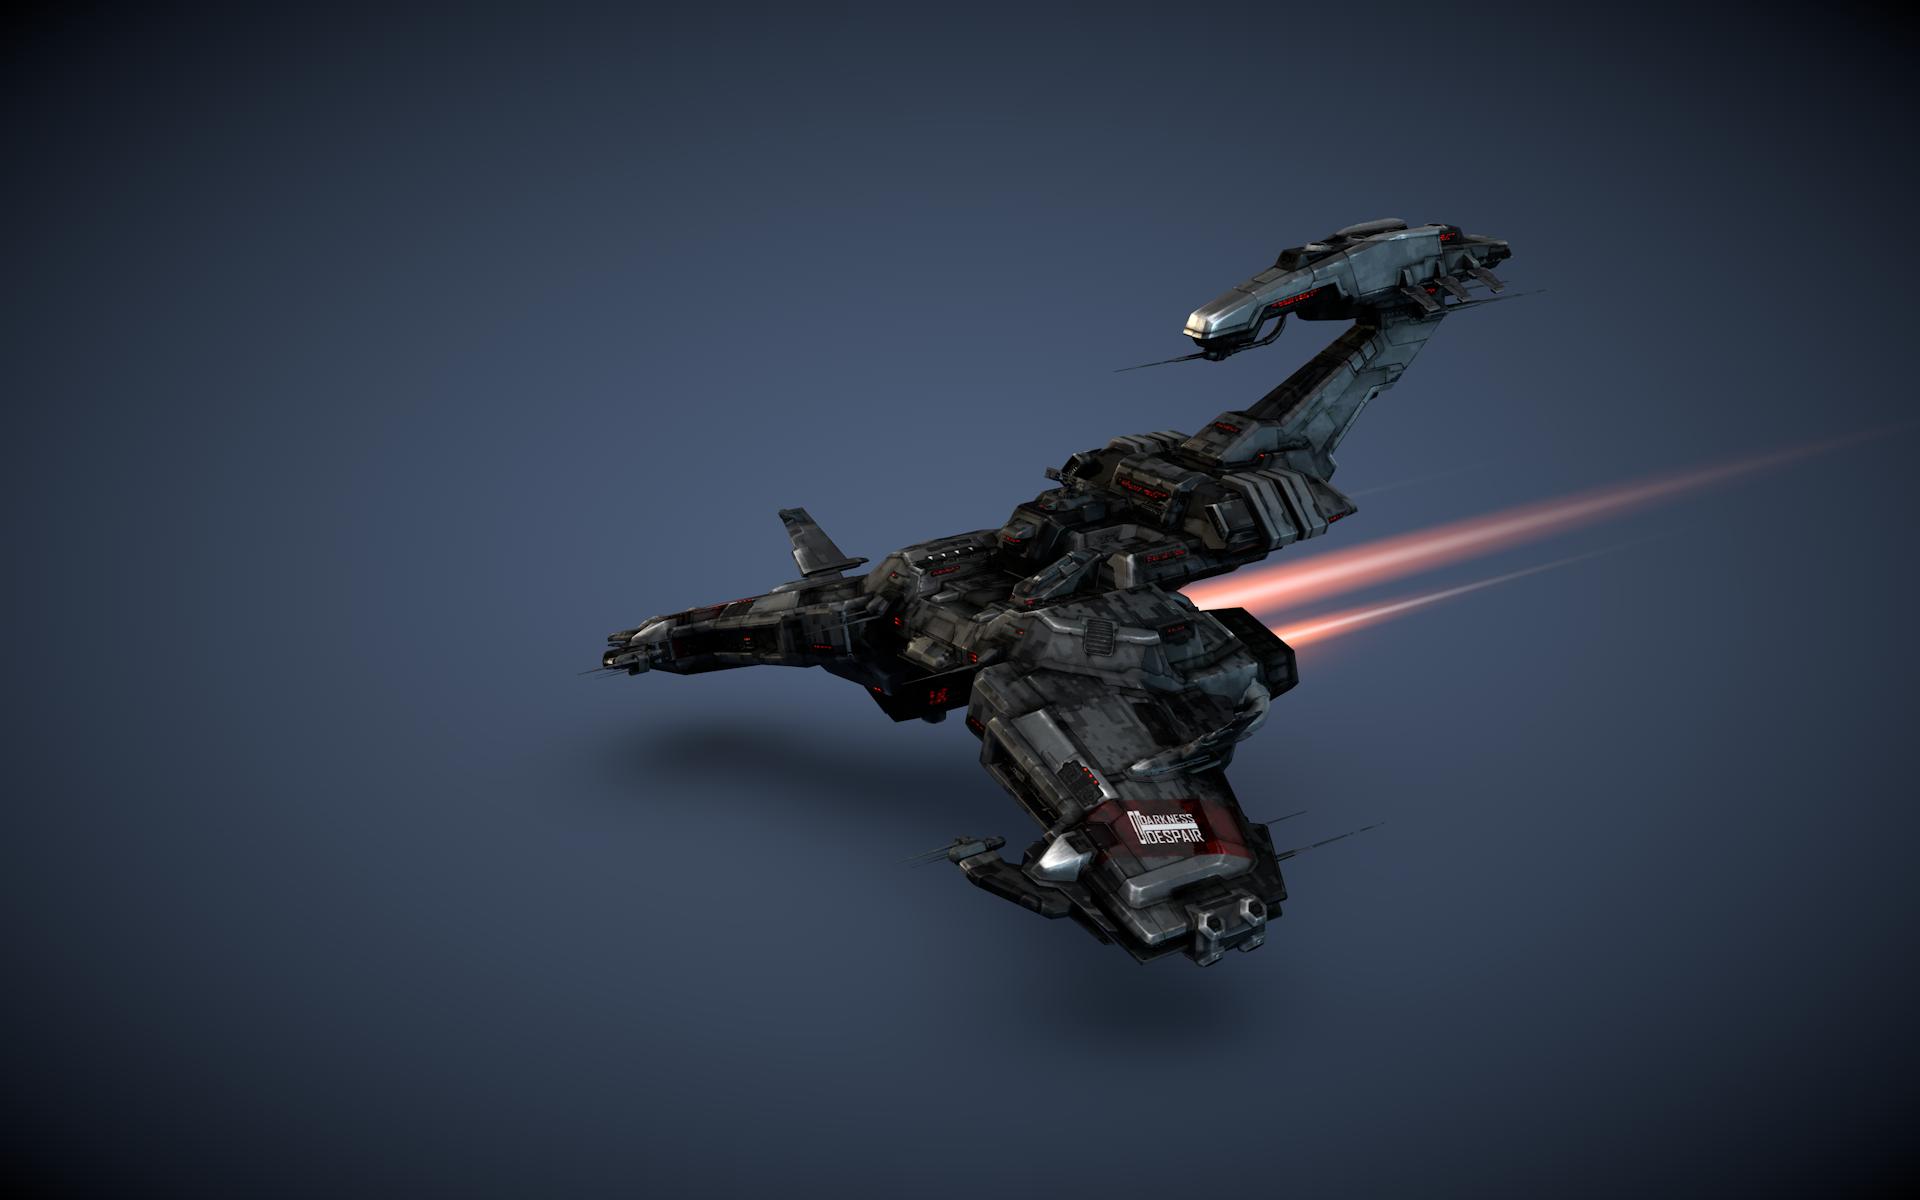 Scorpion Navy Issue By Kaminokage